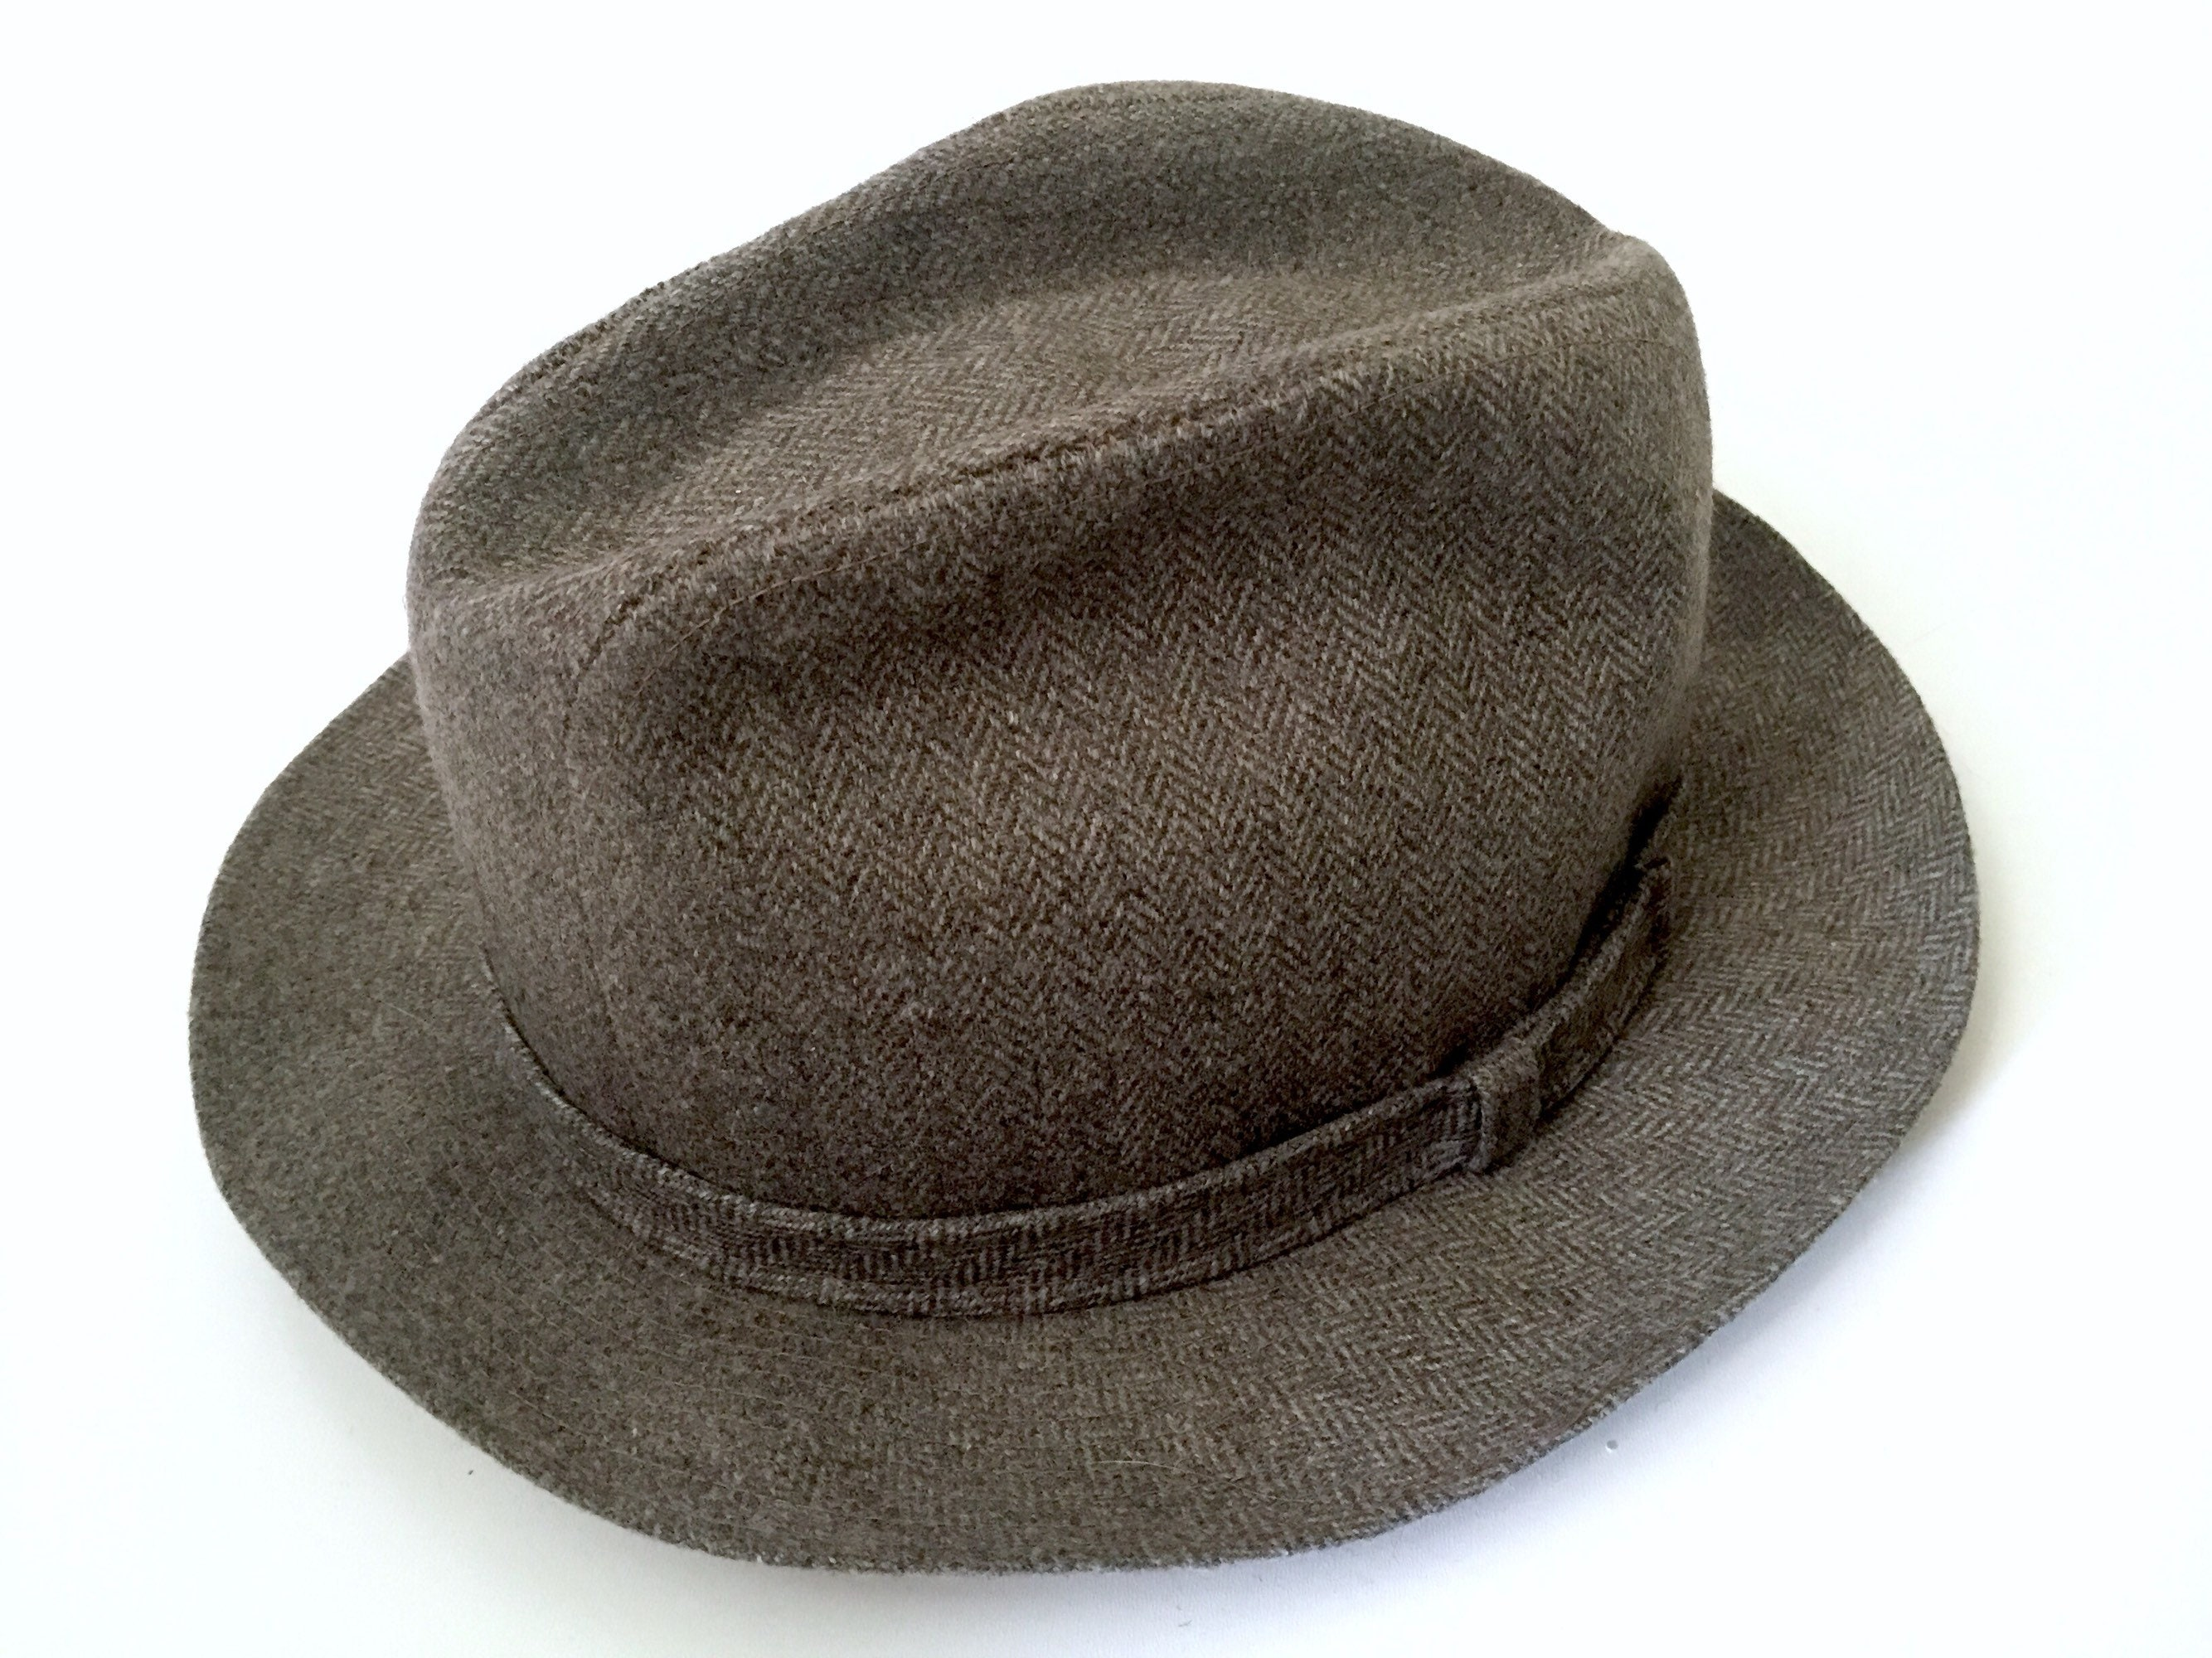 Vintage Biltmore Hat Mens Hats Fedora Hat for Men  a8dce729fad